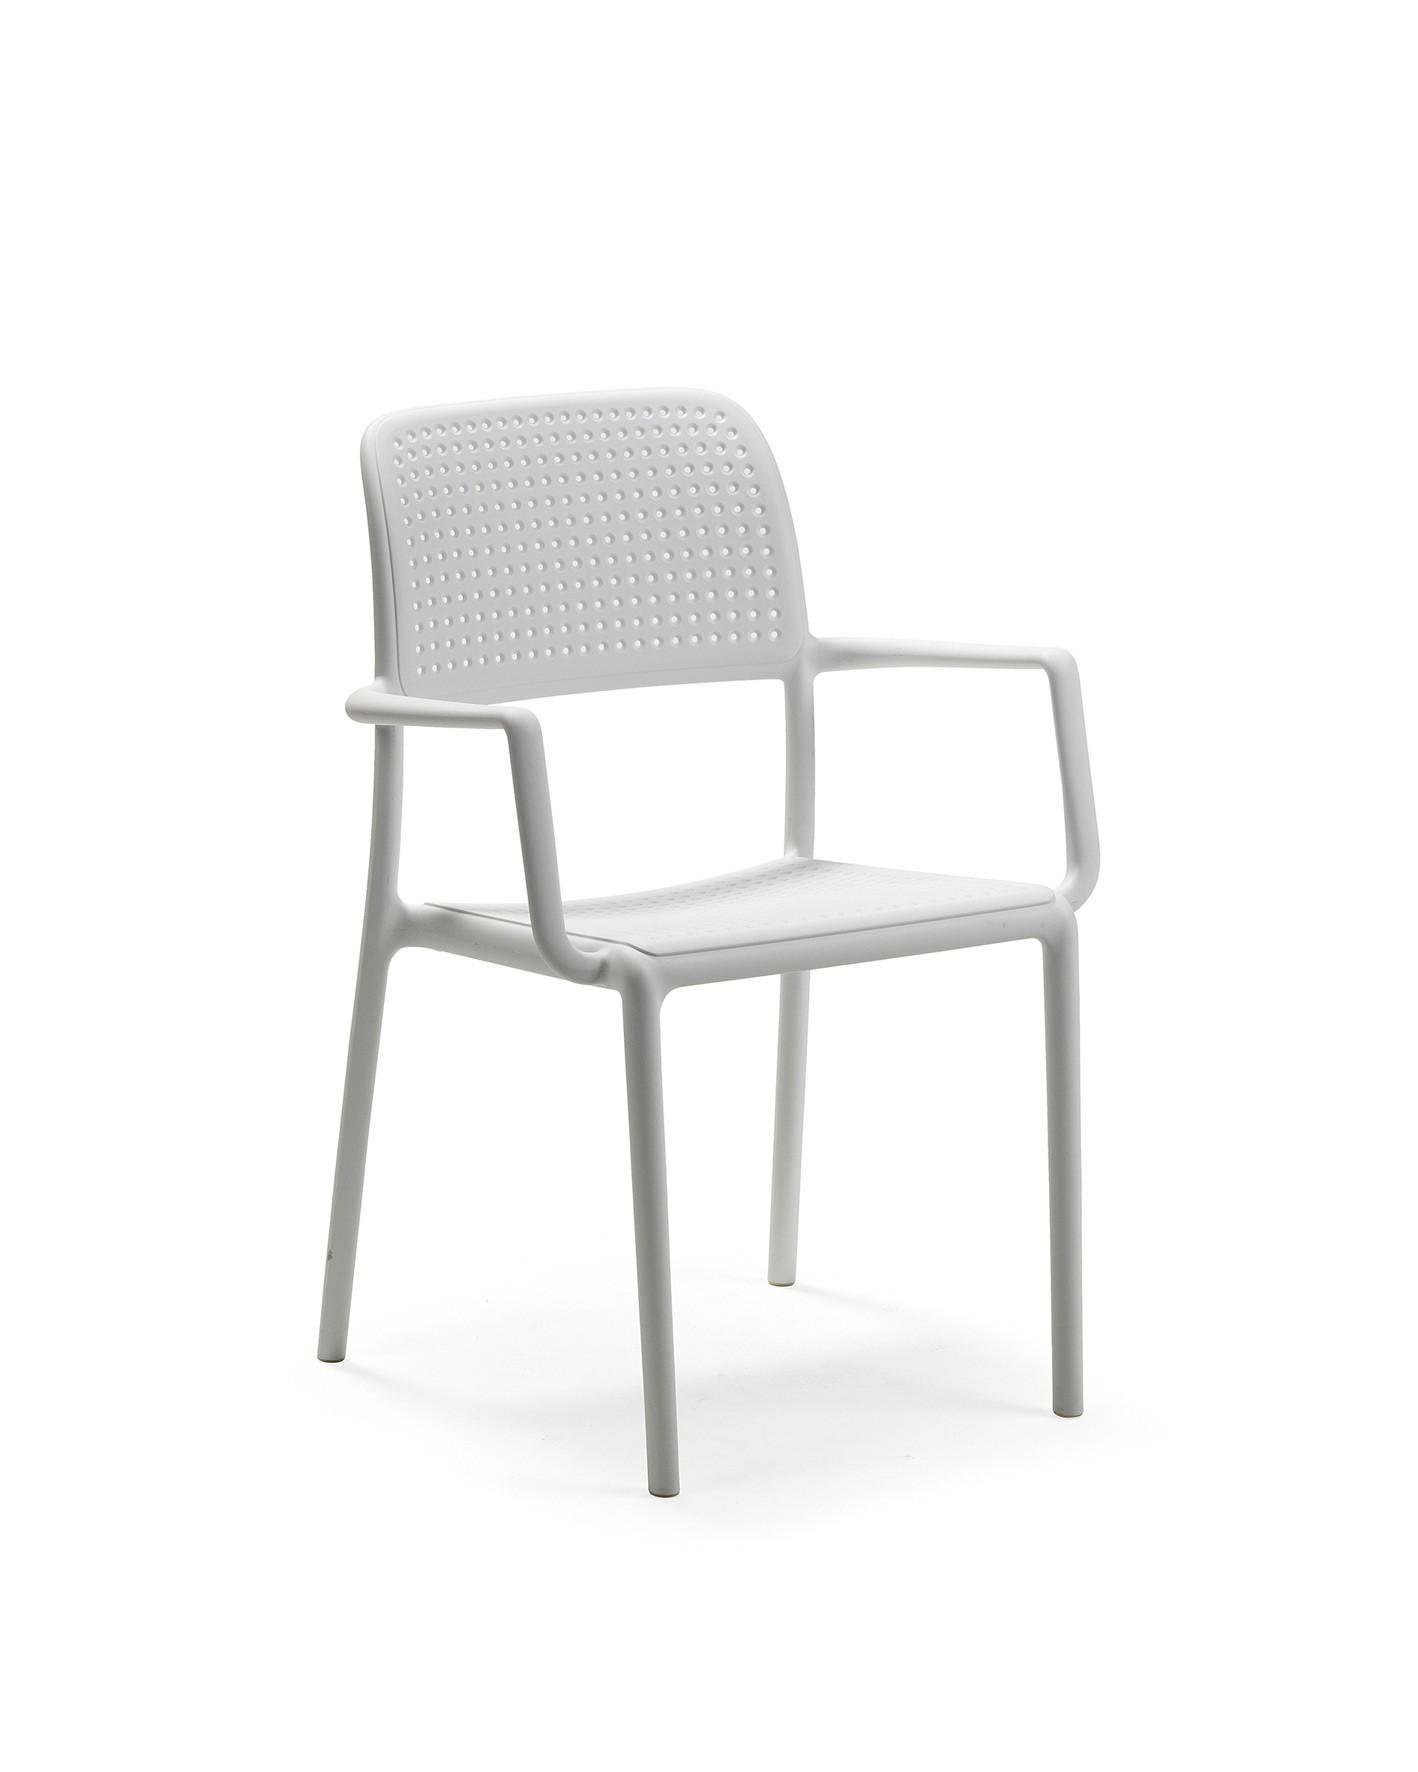 Nardi Stapelstuhl / Gartenstuhl Bora Kunststoff stapelbar bianco Bild 1